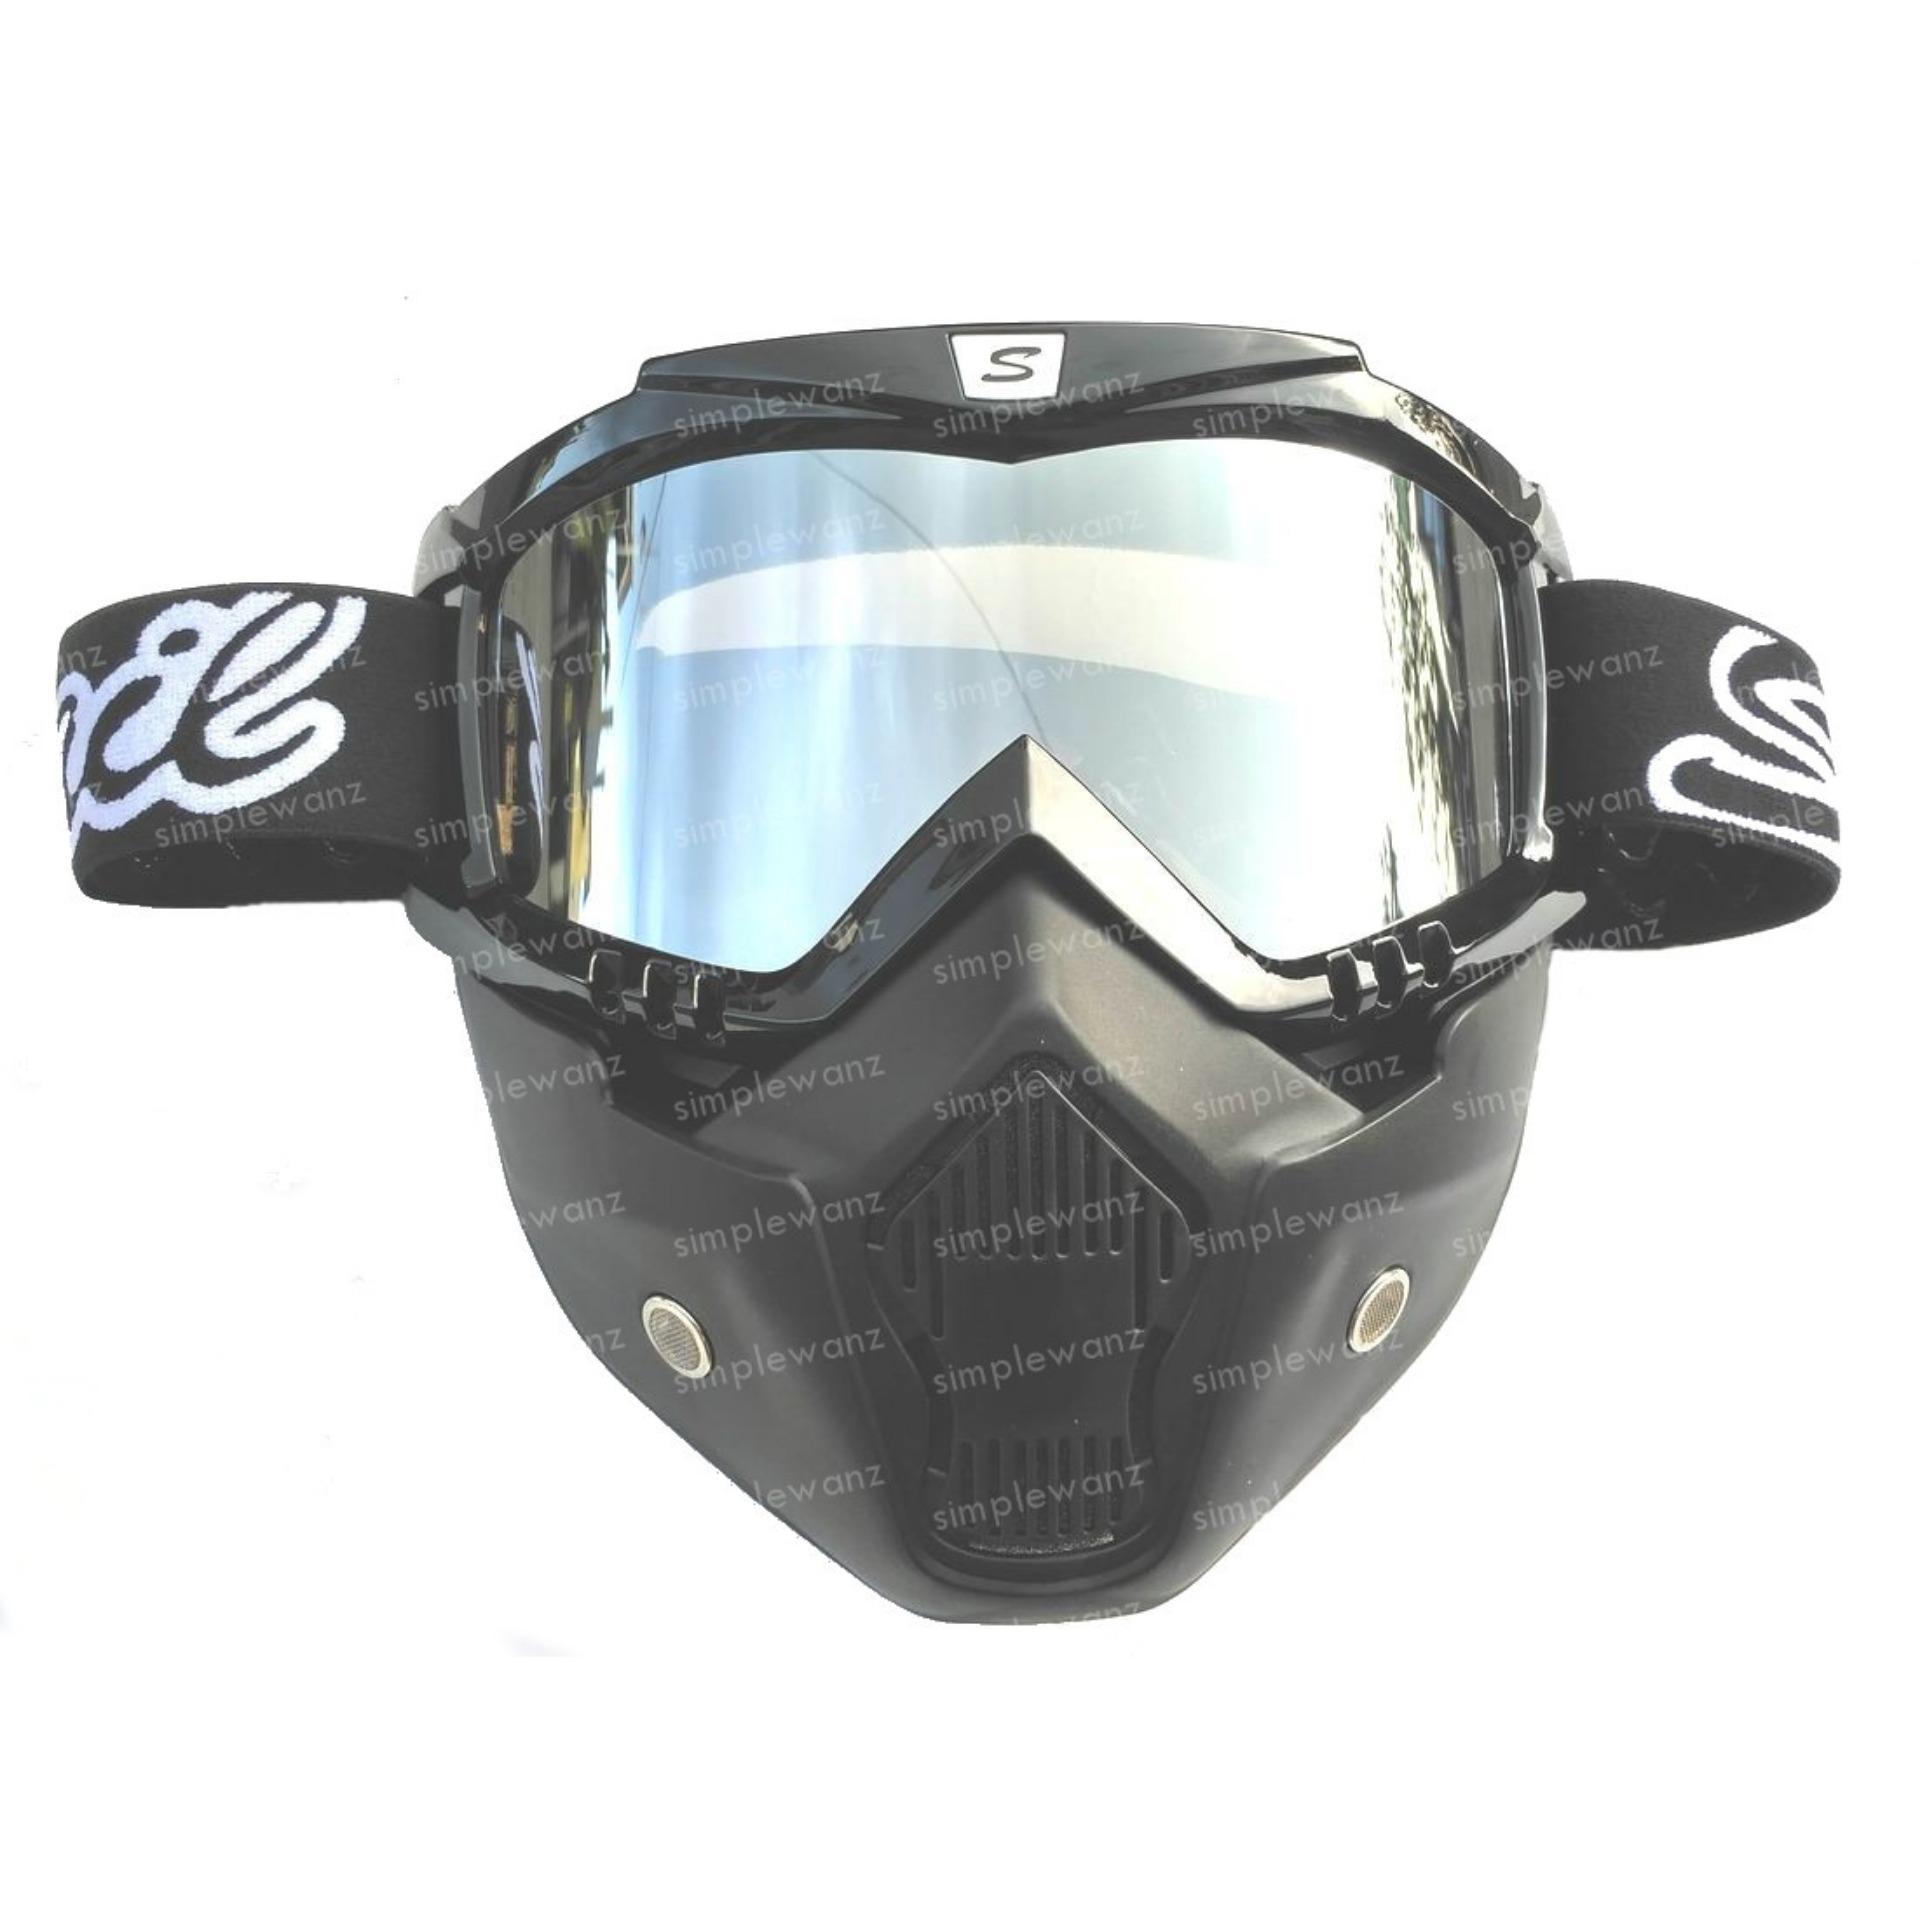 Spesifikasi Goggle Alien Snail M20 Shark Mask Modular Google Mx20 Masker Topeng Silver Mirror Lens Dan Harganya